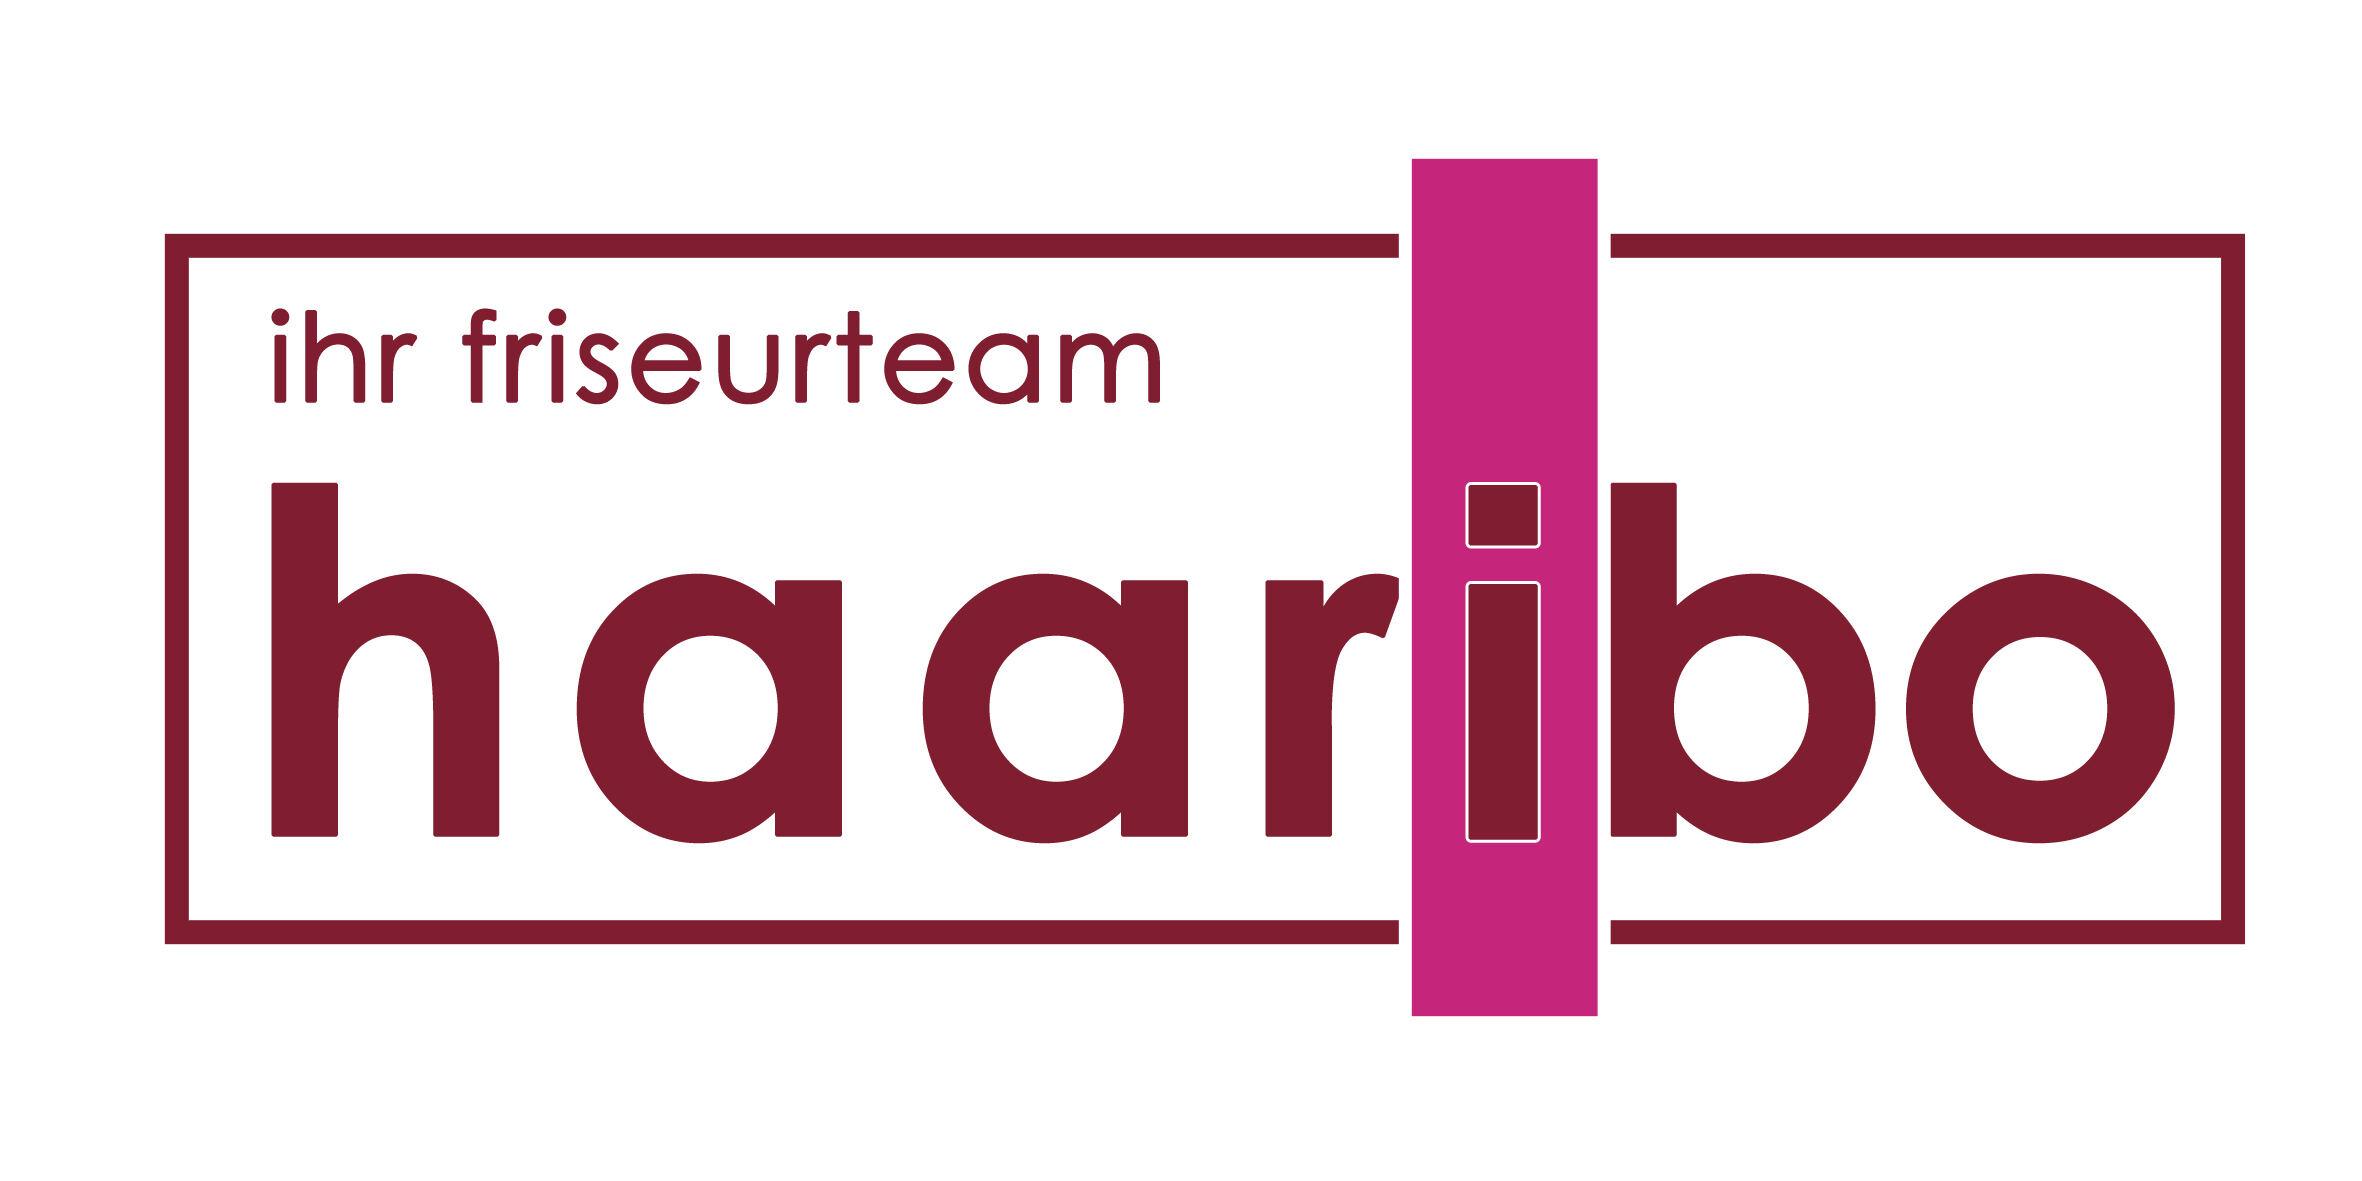 Friseur Haaribo GmbH Logo